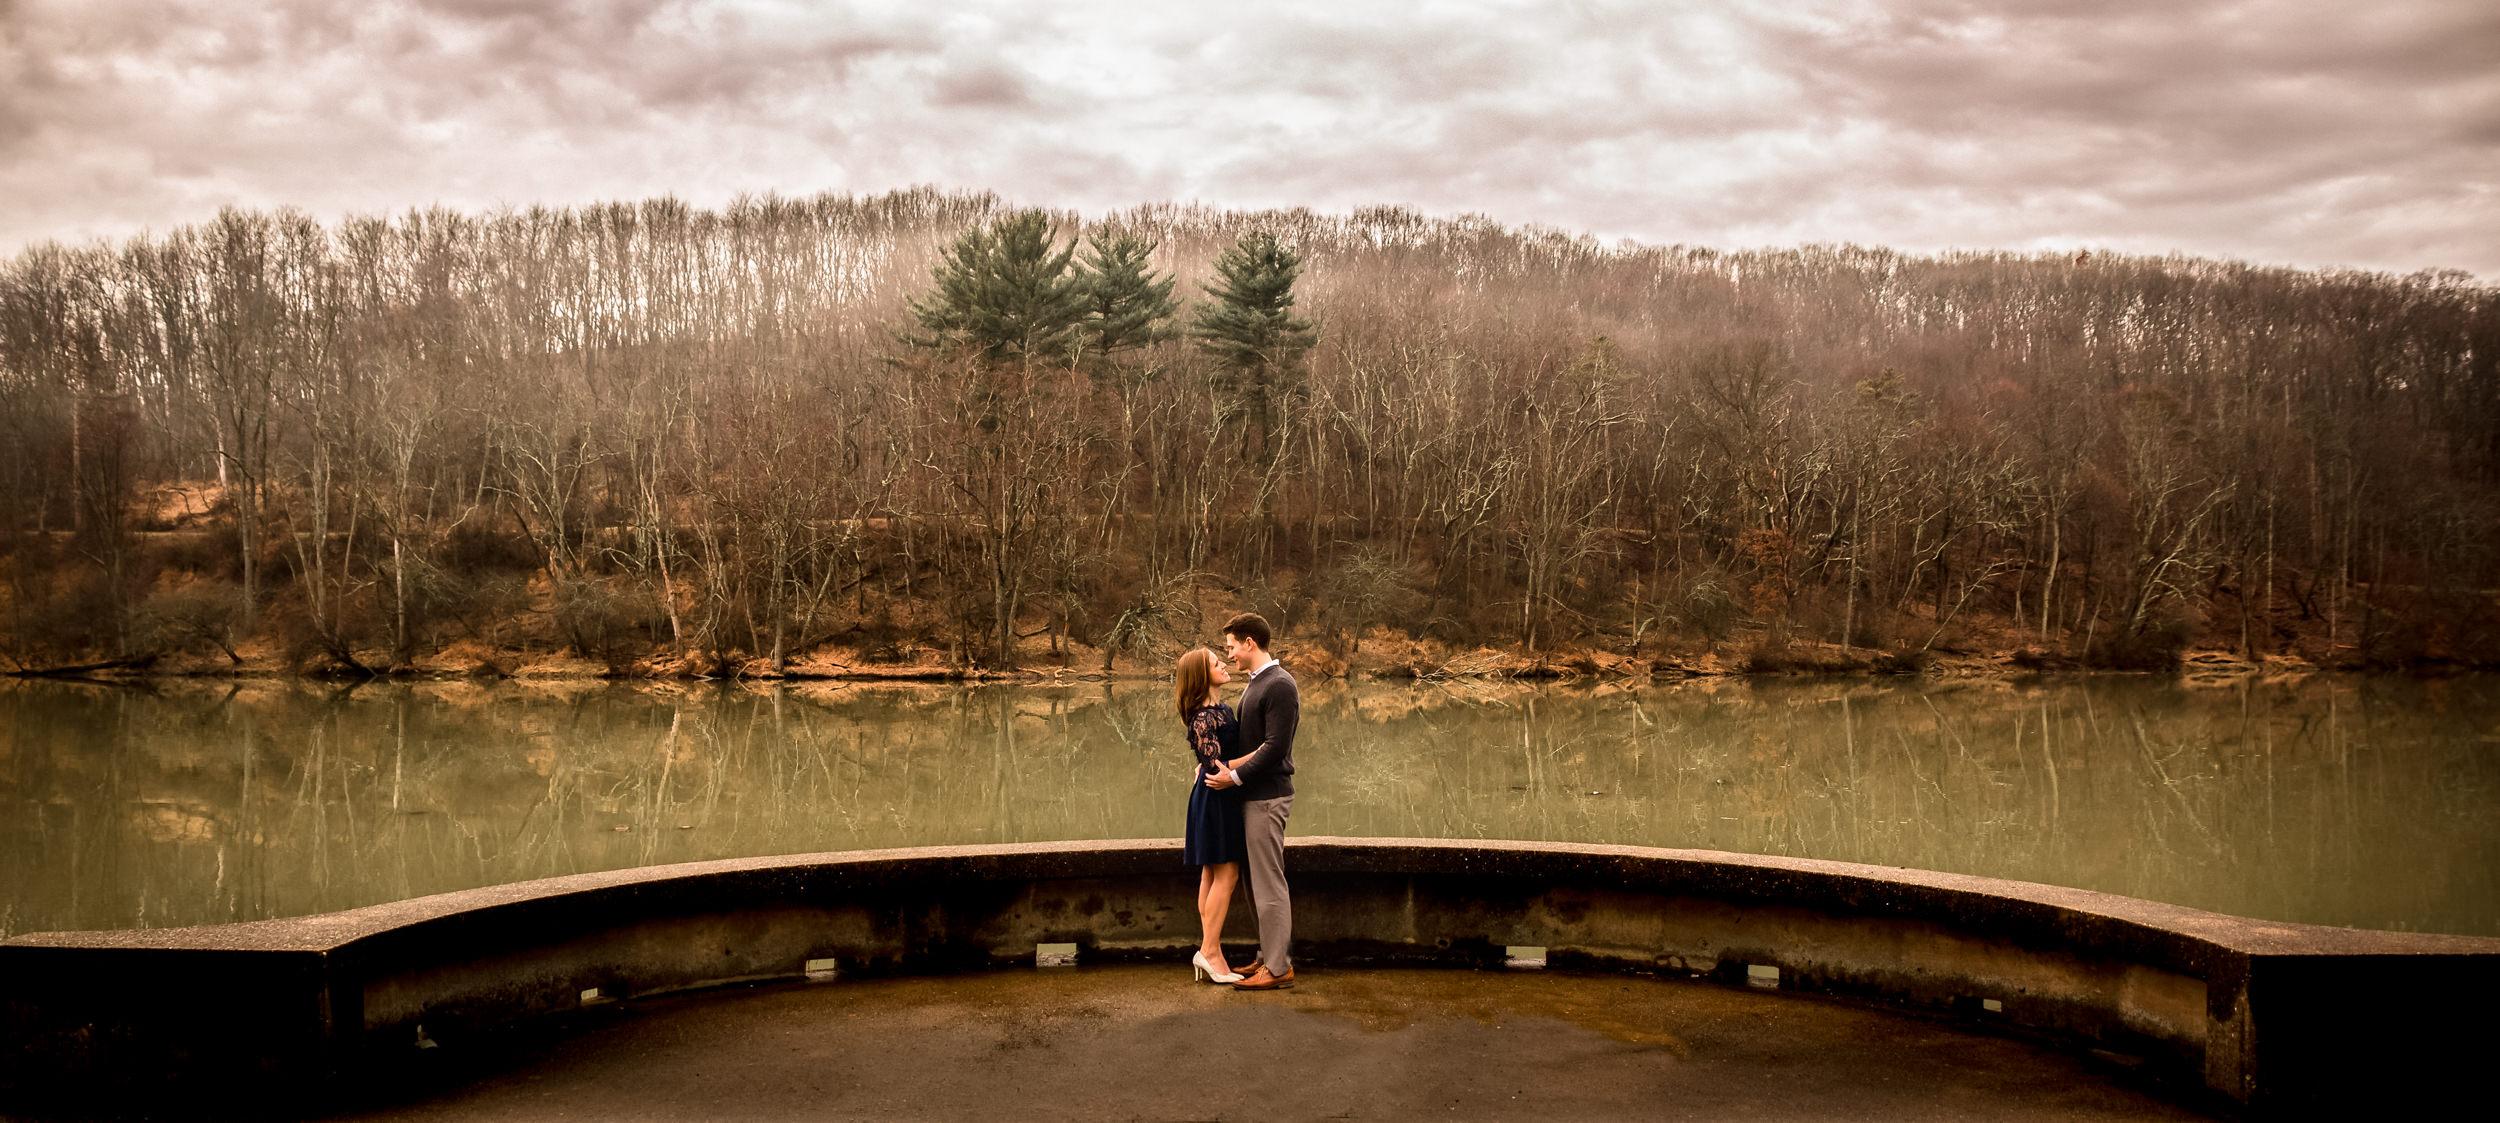 Adam Michaels Photography-15.jpg